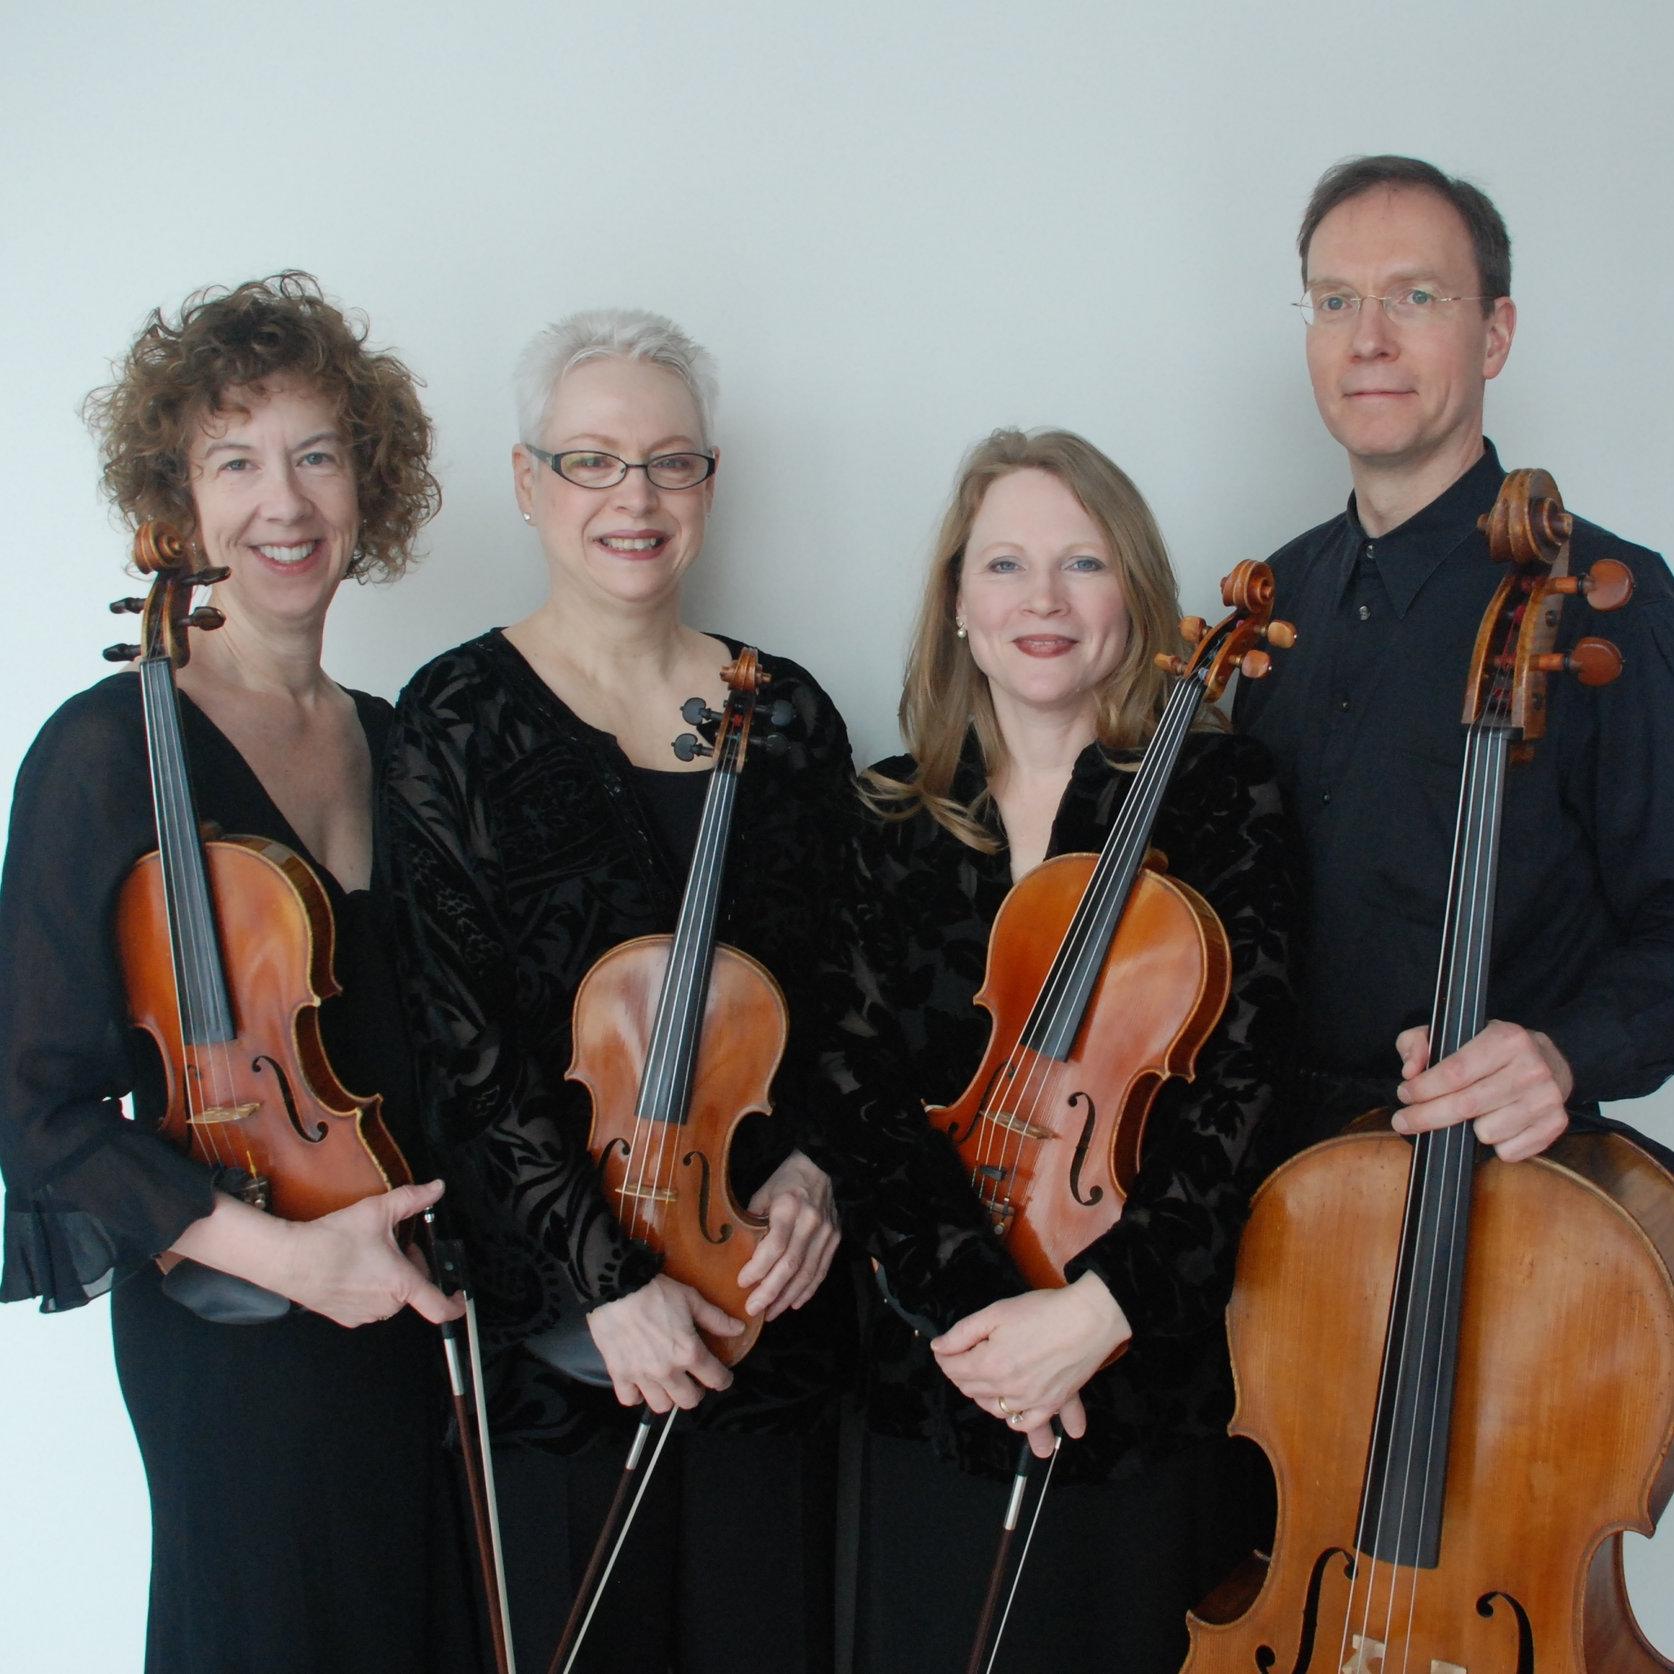 Lake String Quartet: Nanette Scott Goldman,  violin;  Carol Margolis,  violin;  Ingrid Koller,  viola;  Daryl Carlson,  cello